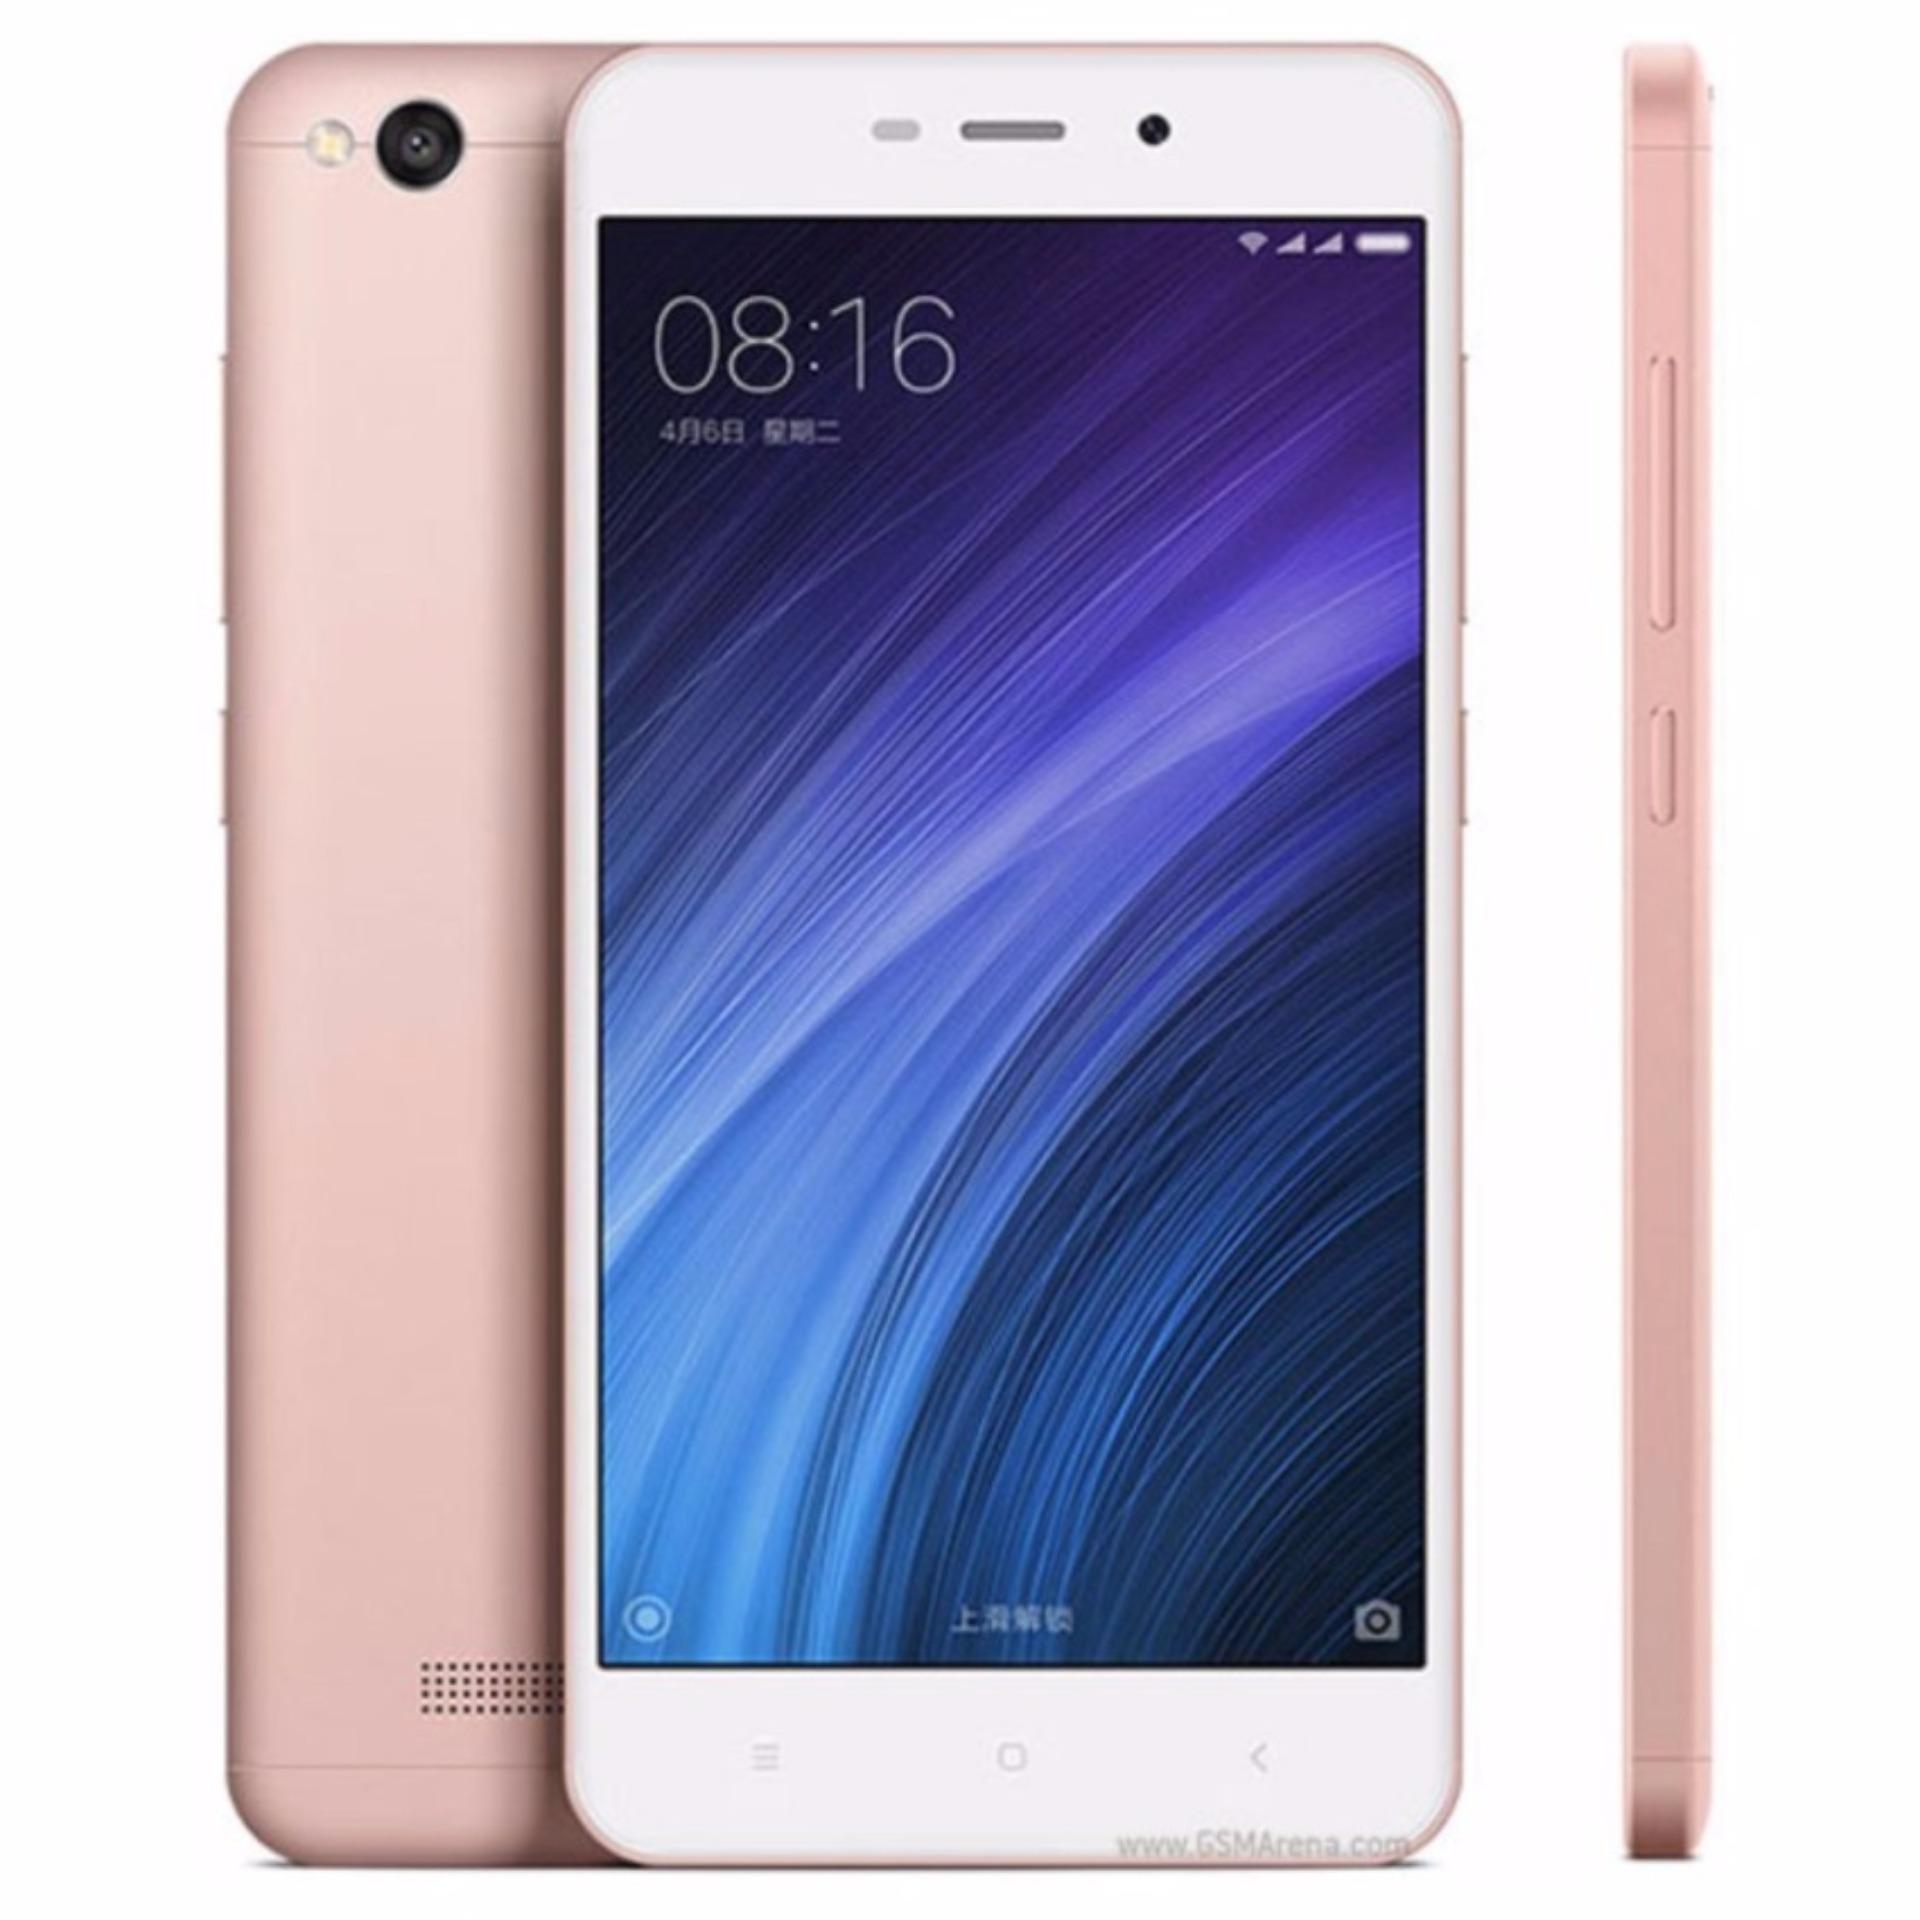 Sale Stock Xiaomi Redmi Note 5a 2 16gb Gtam Gray Gudang Prime Grey Ram 2gb Internal 32gb Garansi Distributor 1thn 4a 1 Tahun